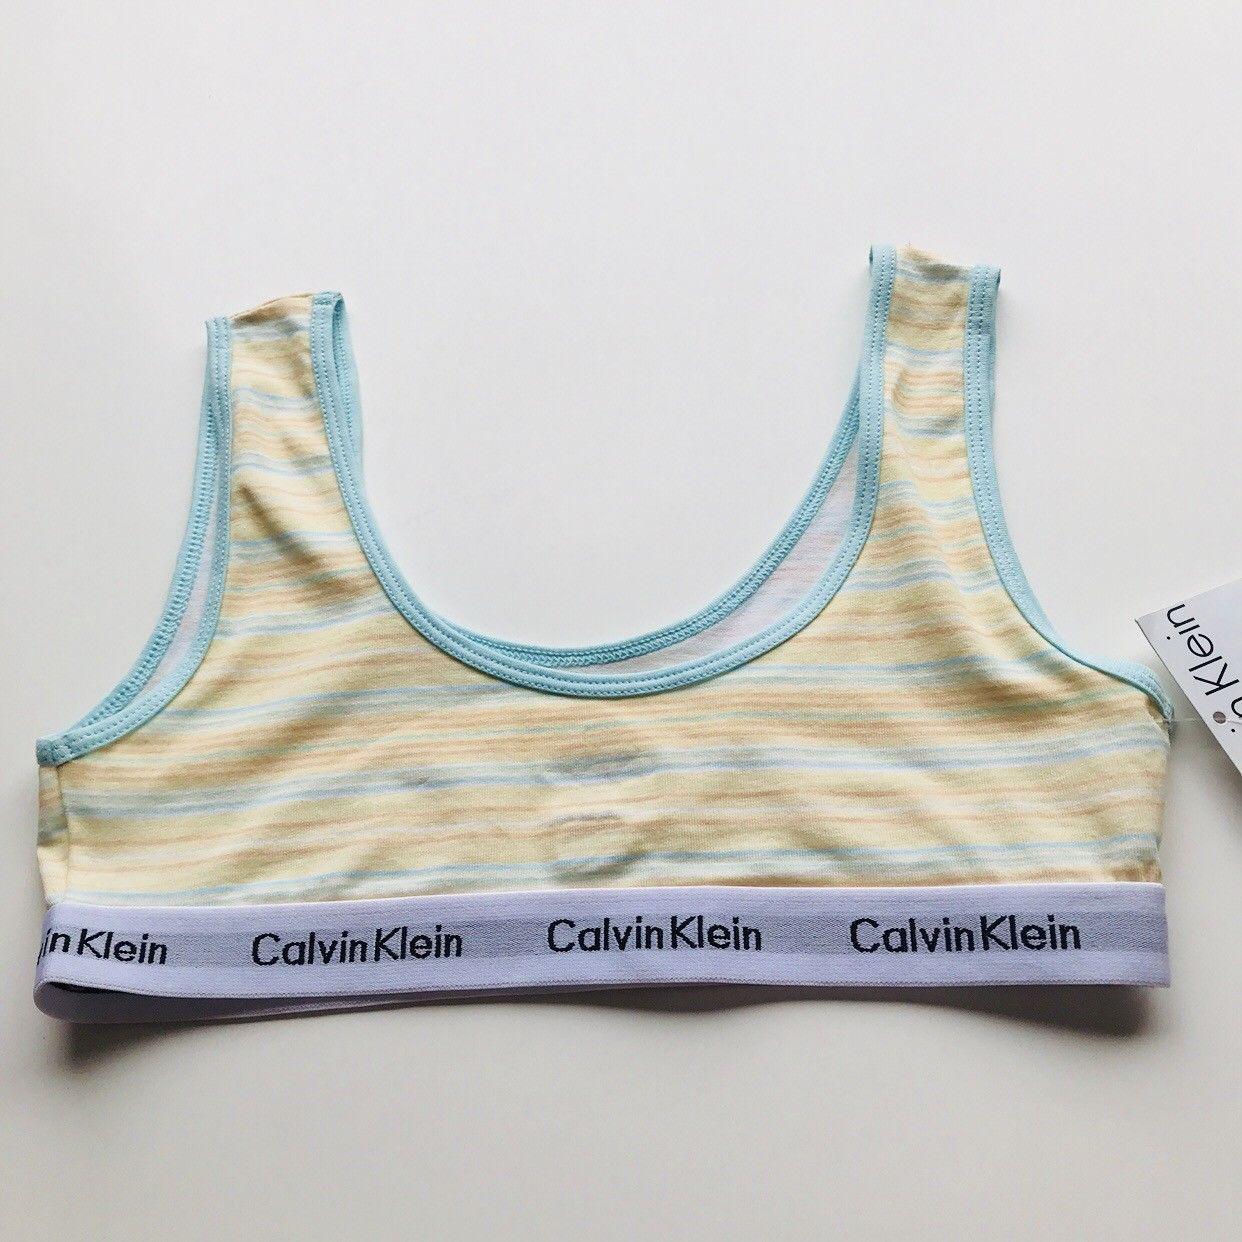 4611ac43bea00c Calvin Klein Girls Bralette 12 14 Yellow and 50 similar items